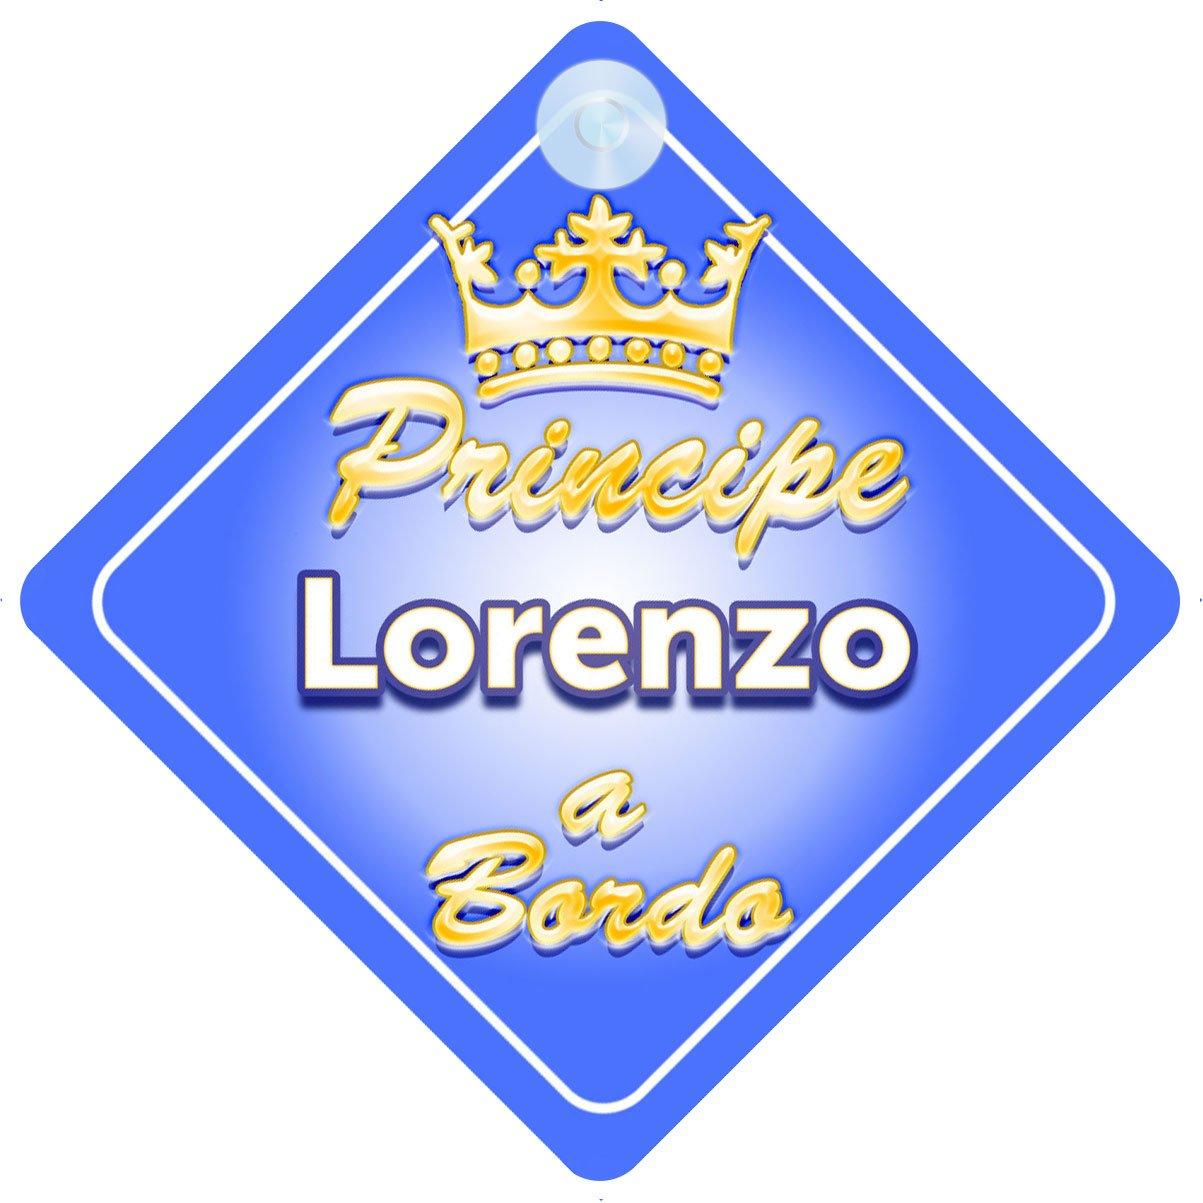 Corona (Crown) Principe Lorenzo / adesivo bimbo / bambino / neonato a bordo per maschi principe / principino adesivo macchina Quality Goods Ltd